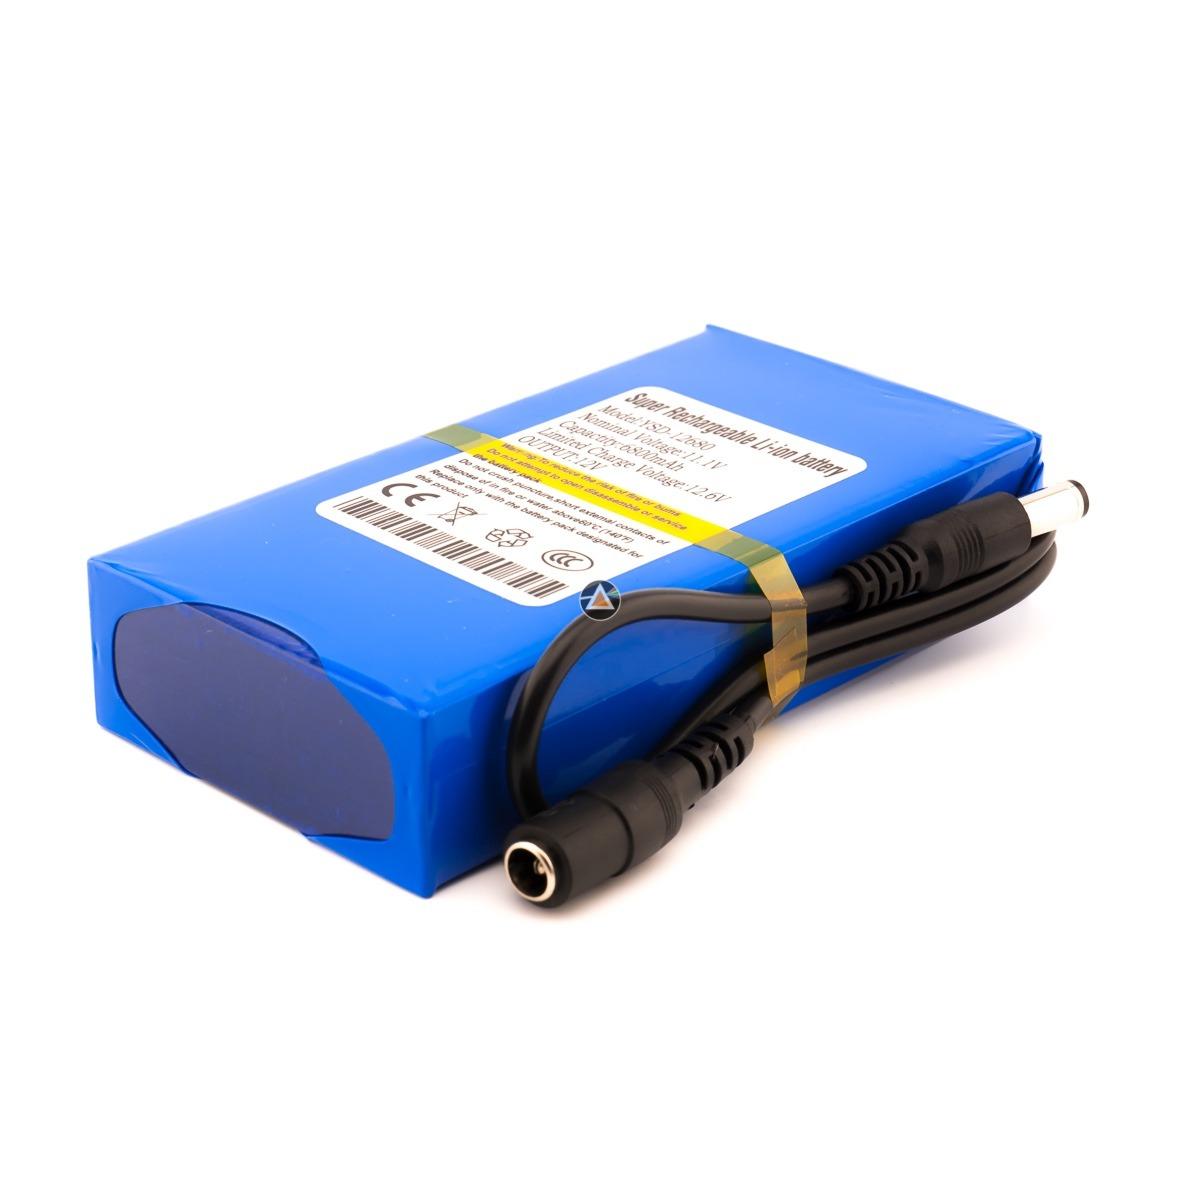 Bateria Recargable Litio 12v 6800 Mah Para Tiras Led At Tl 99900